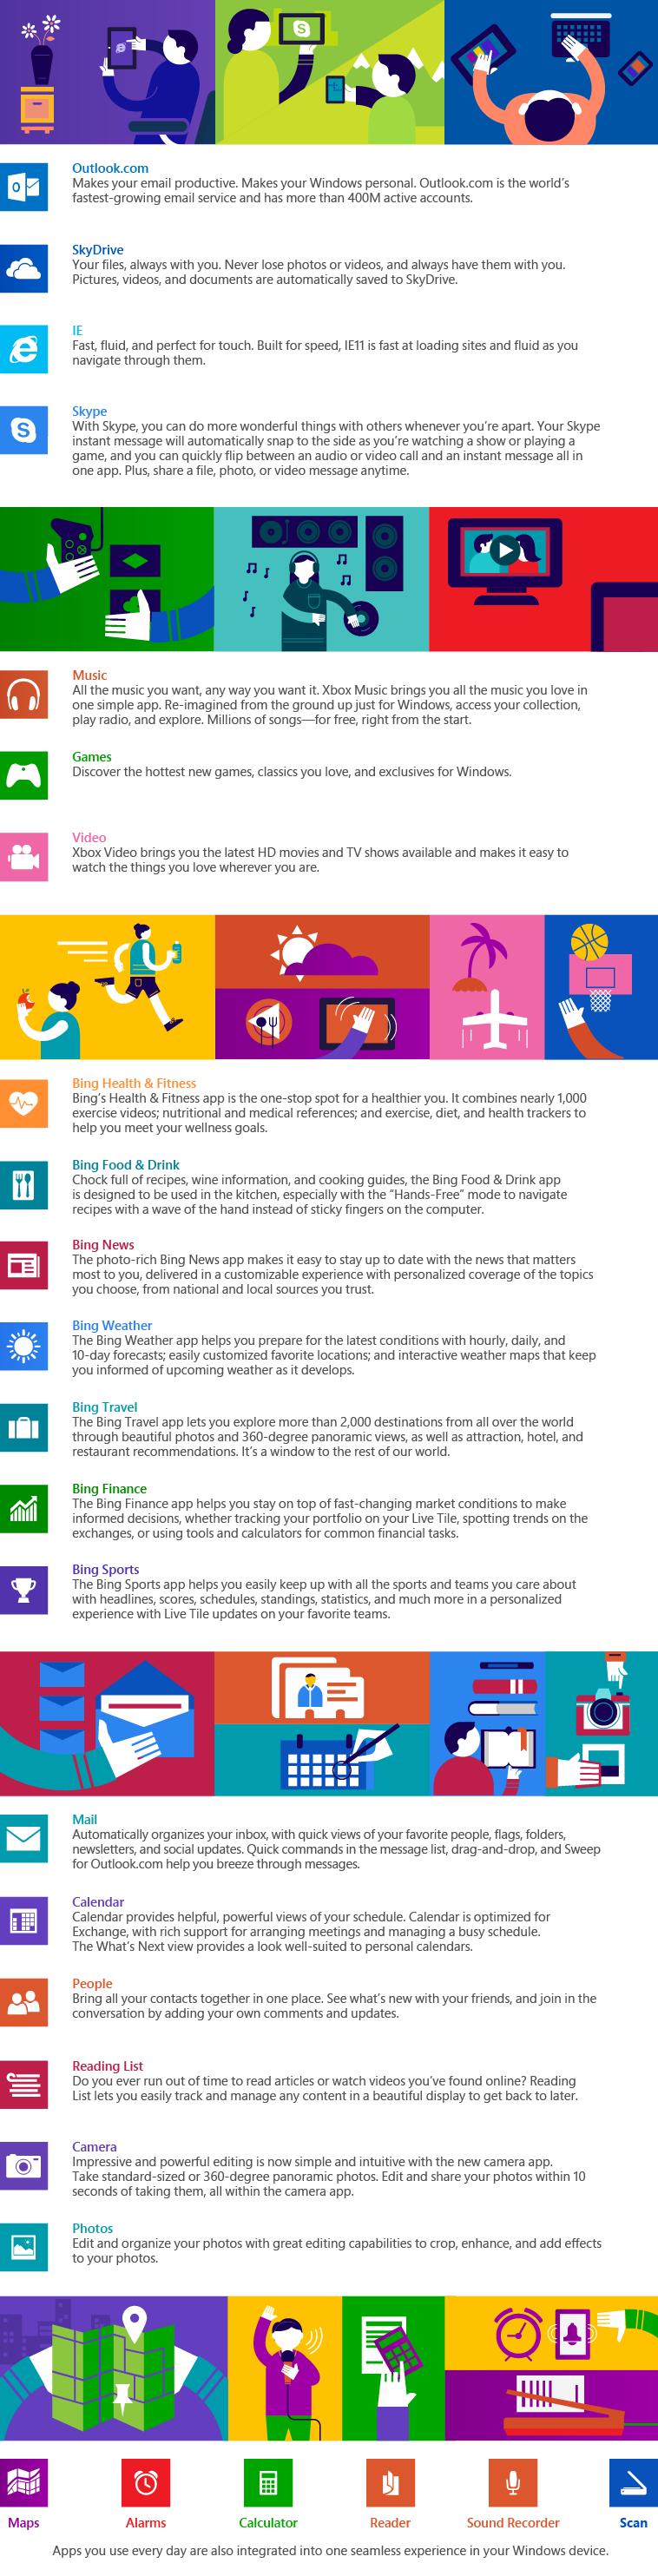 Microsoft-Windows---Final-Design-08.15.13_056B4E49